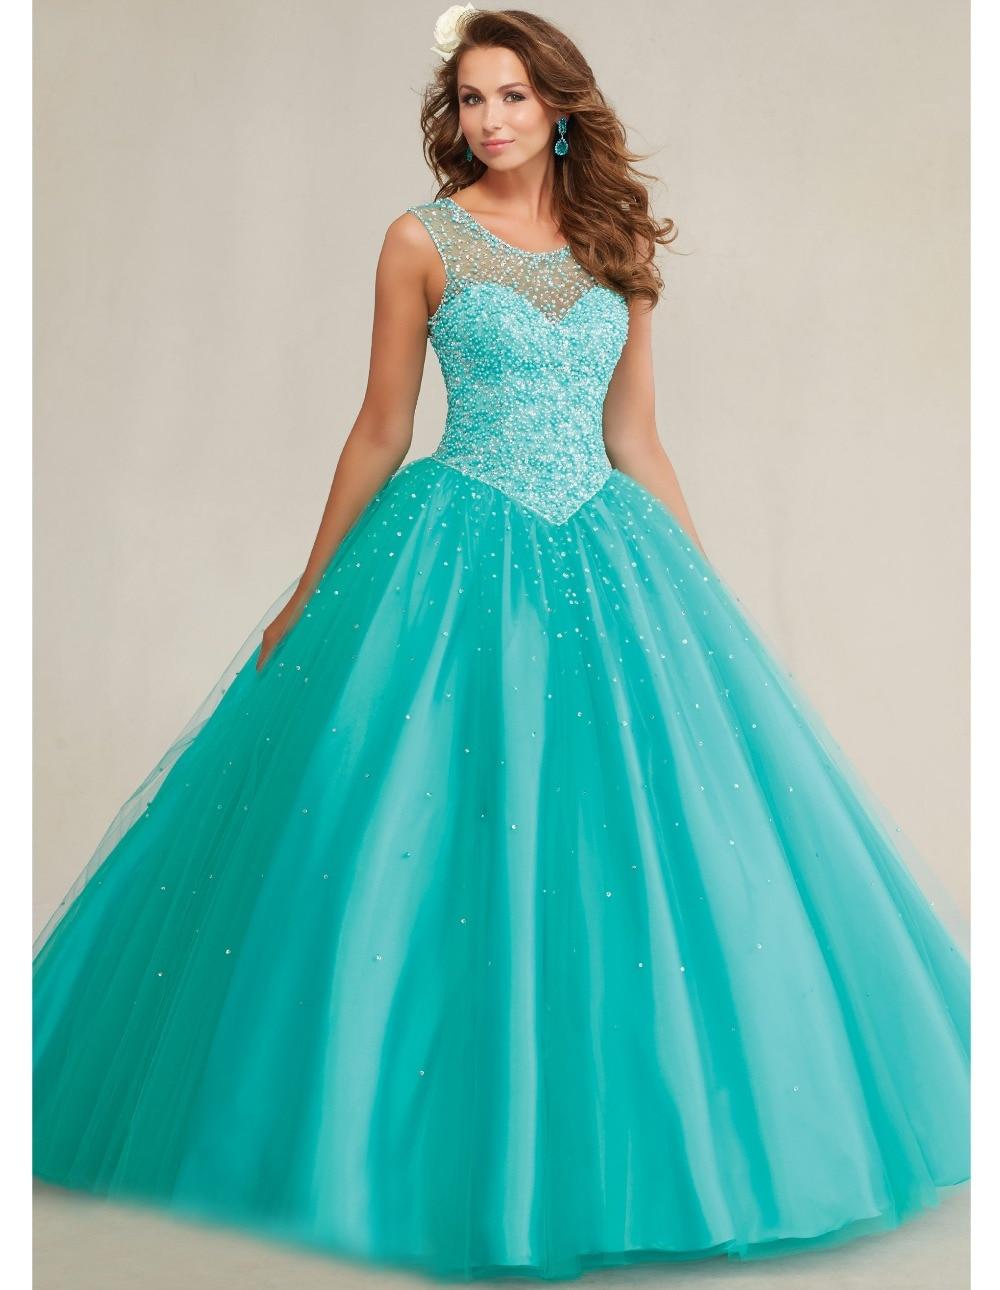 quinceanera 15 years vestidos de 15 anos 2015 blue sweet 16 dresses ...